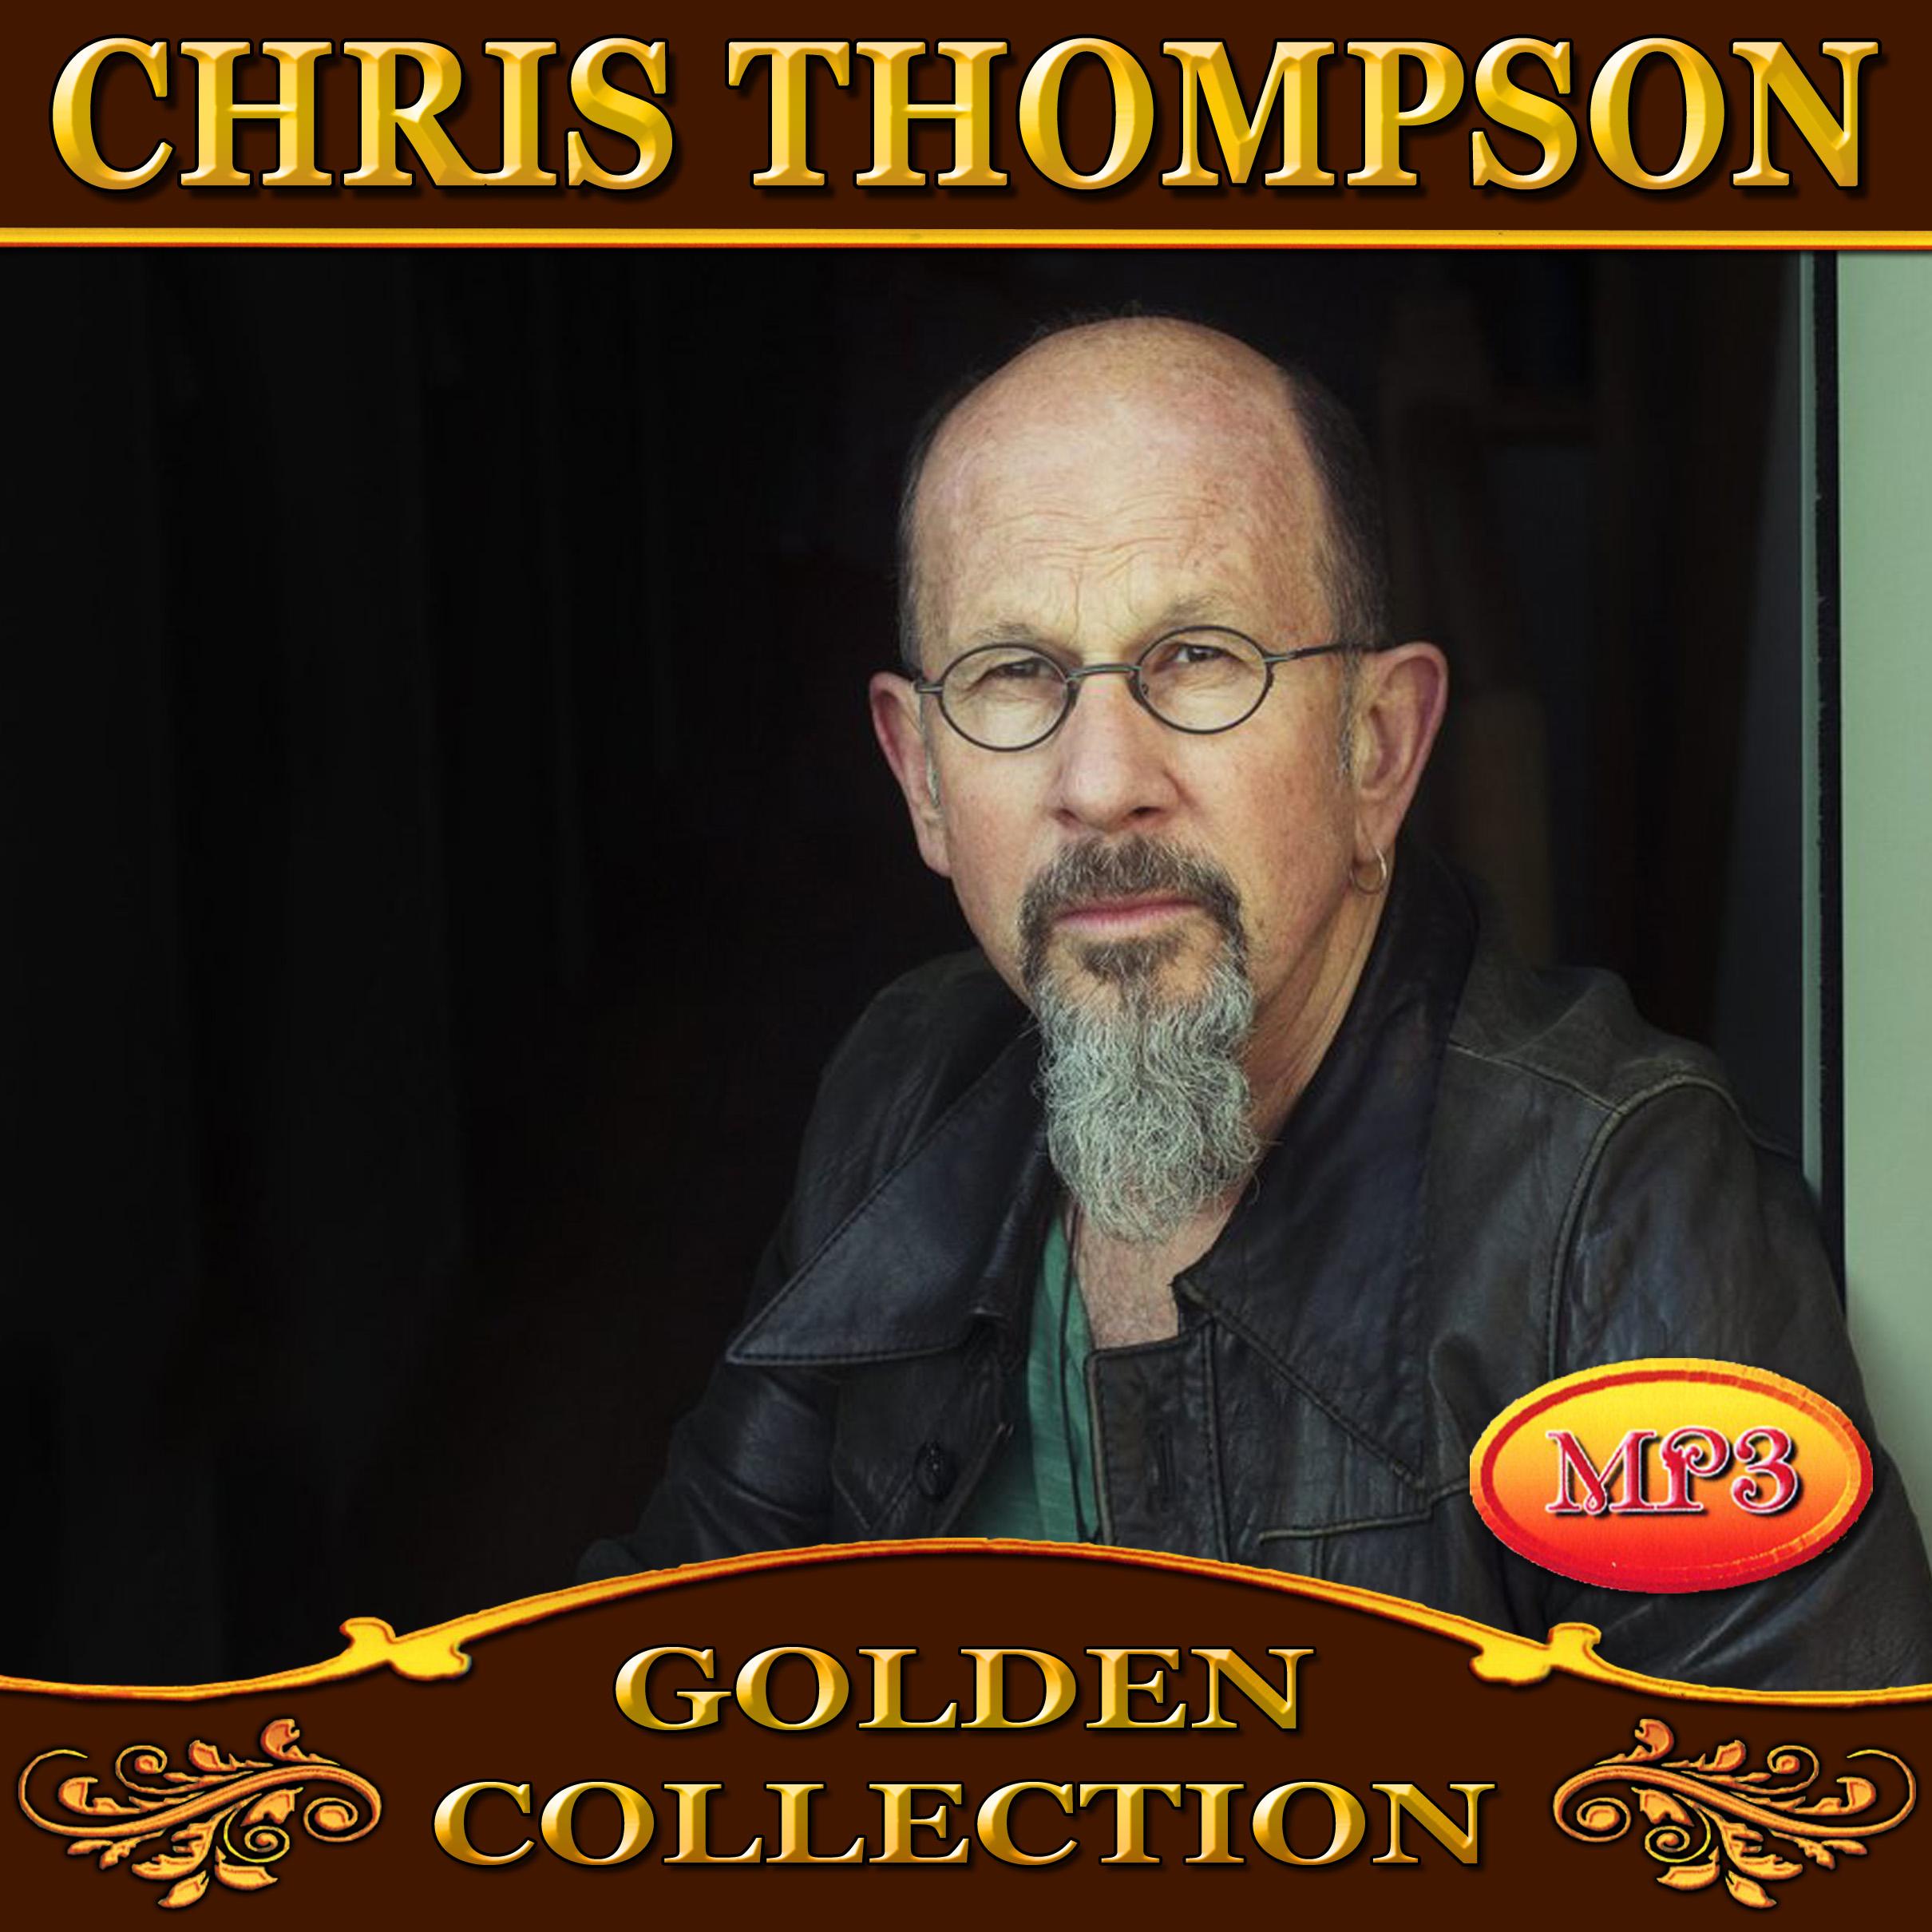 Chris Thompson [mp3]